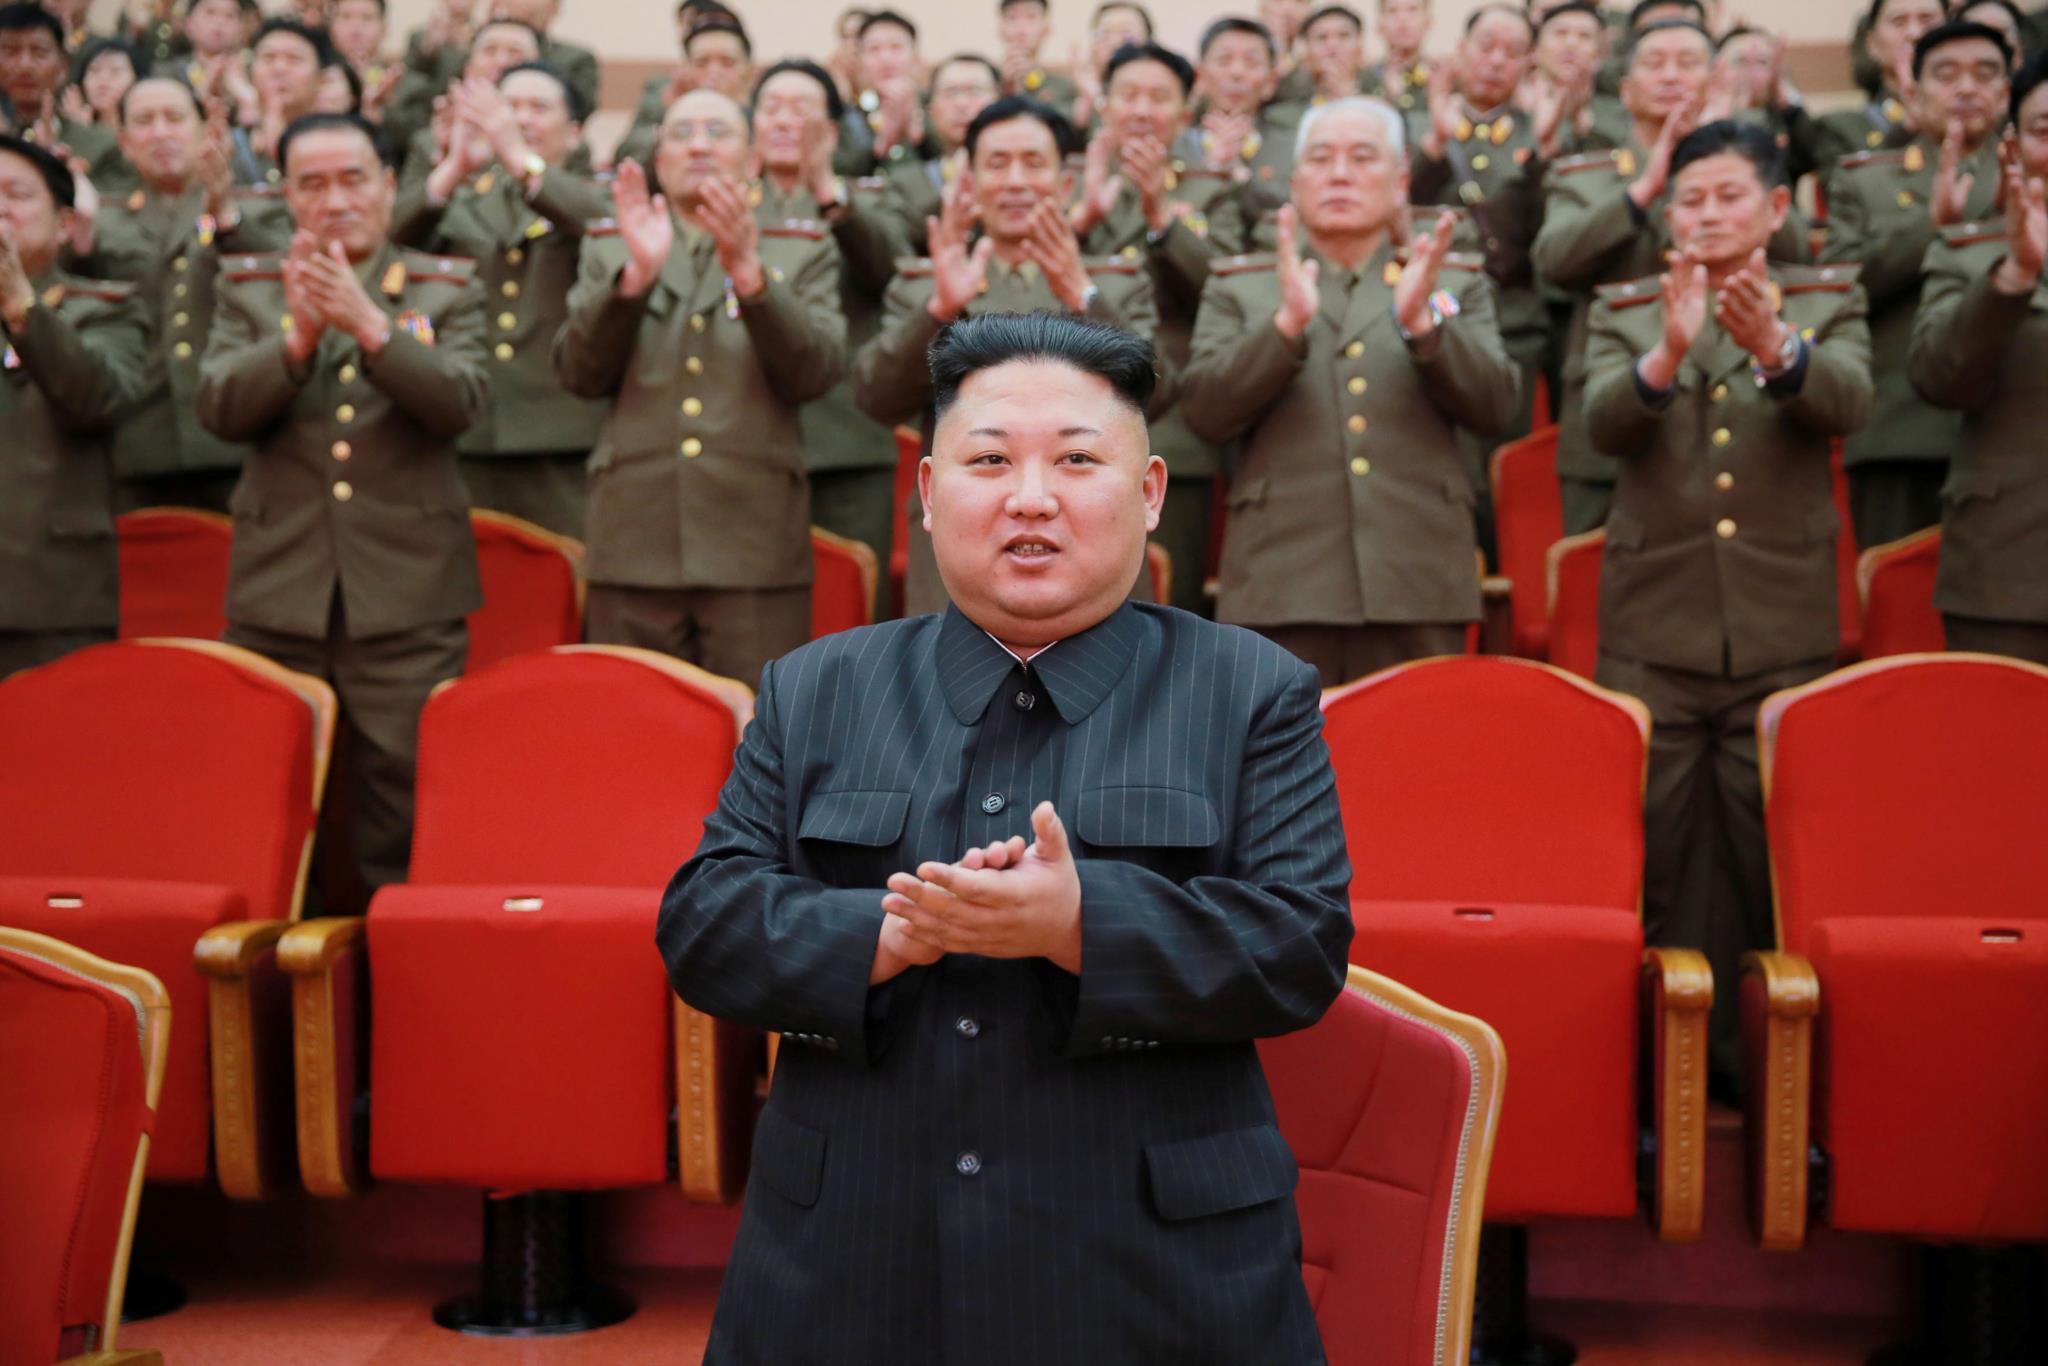 PÚBLICO - Coreia do Norte terá o terceiro maior arsenal de armas químicas